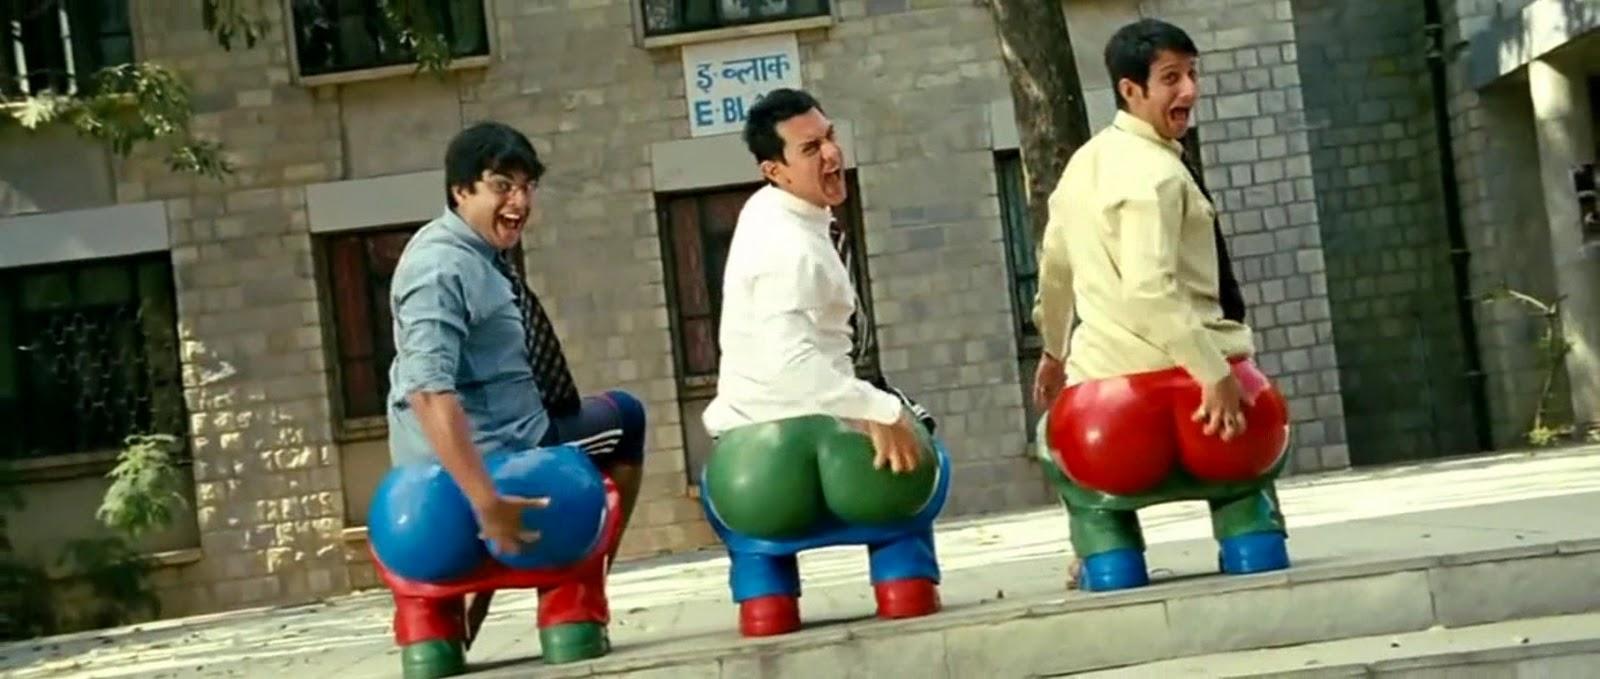 3 idiots full movie hd quality free download